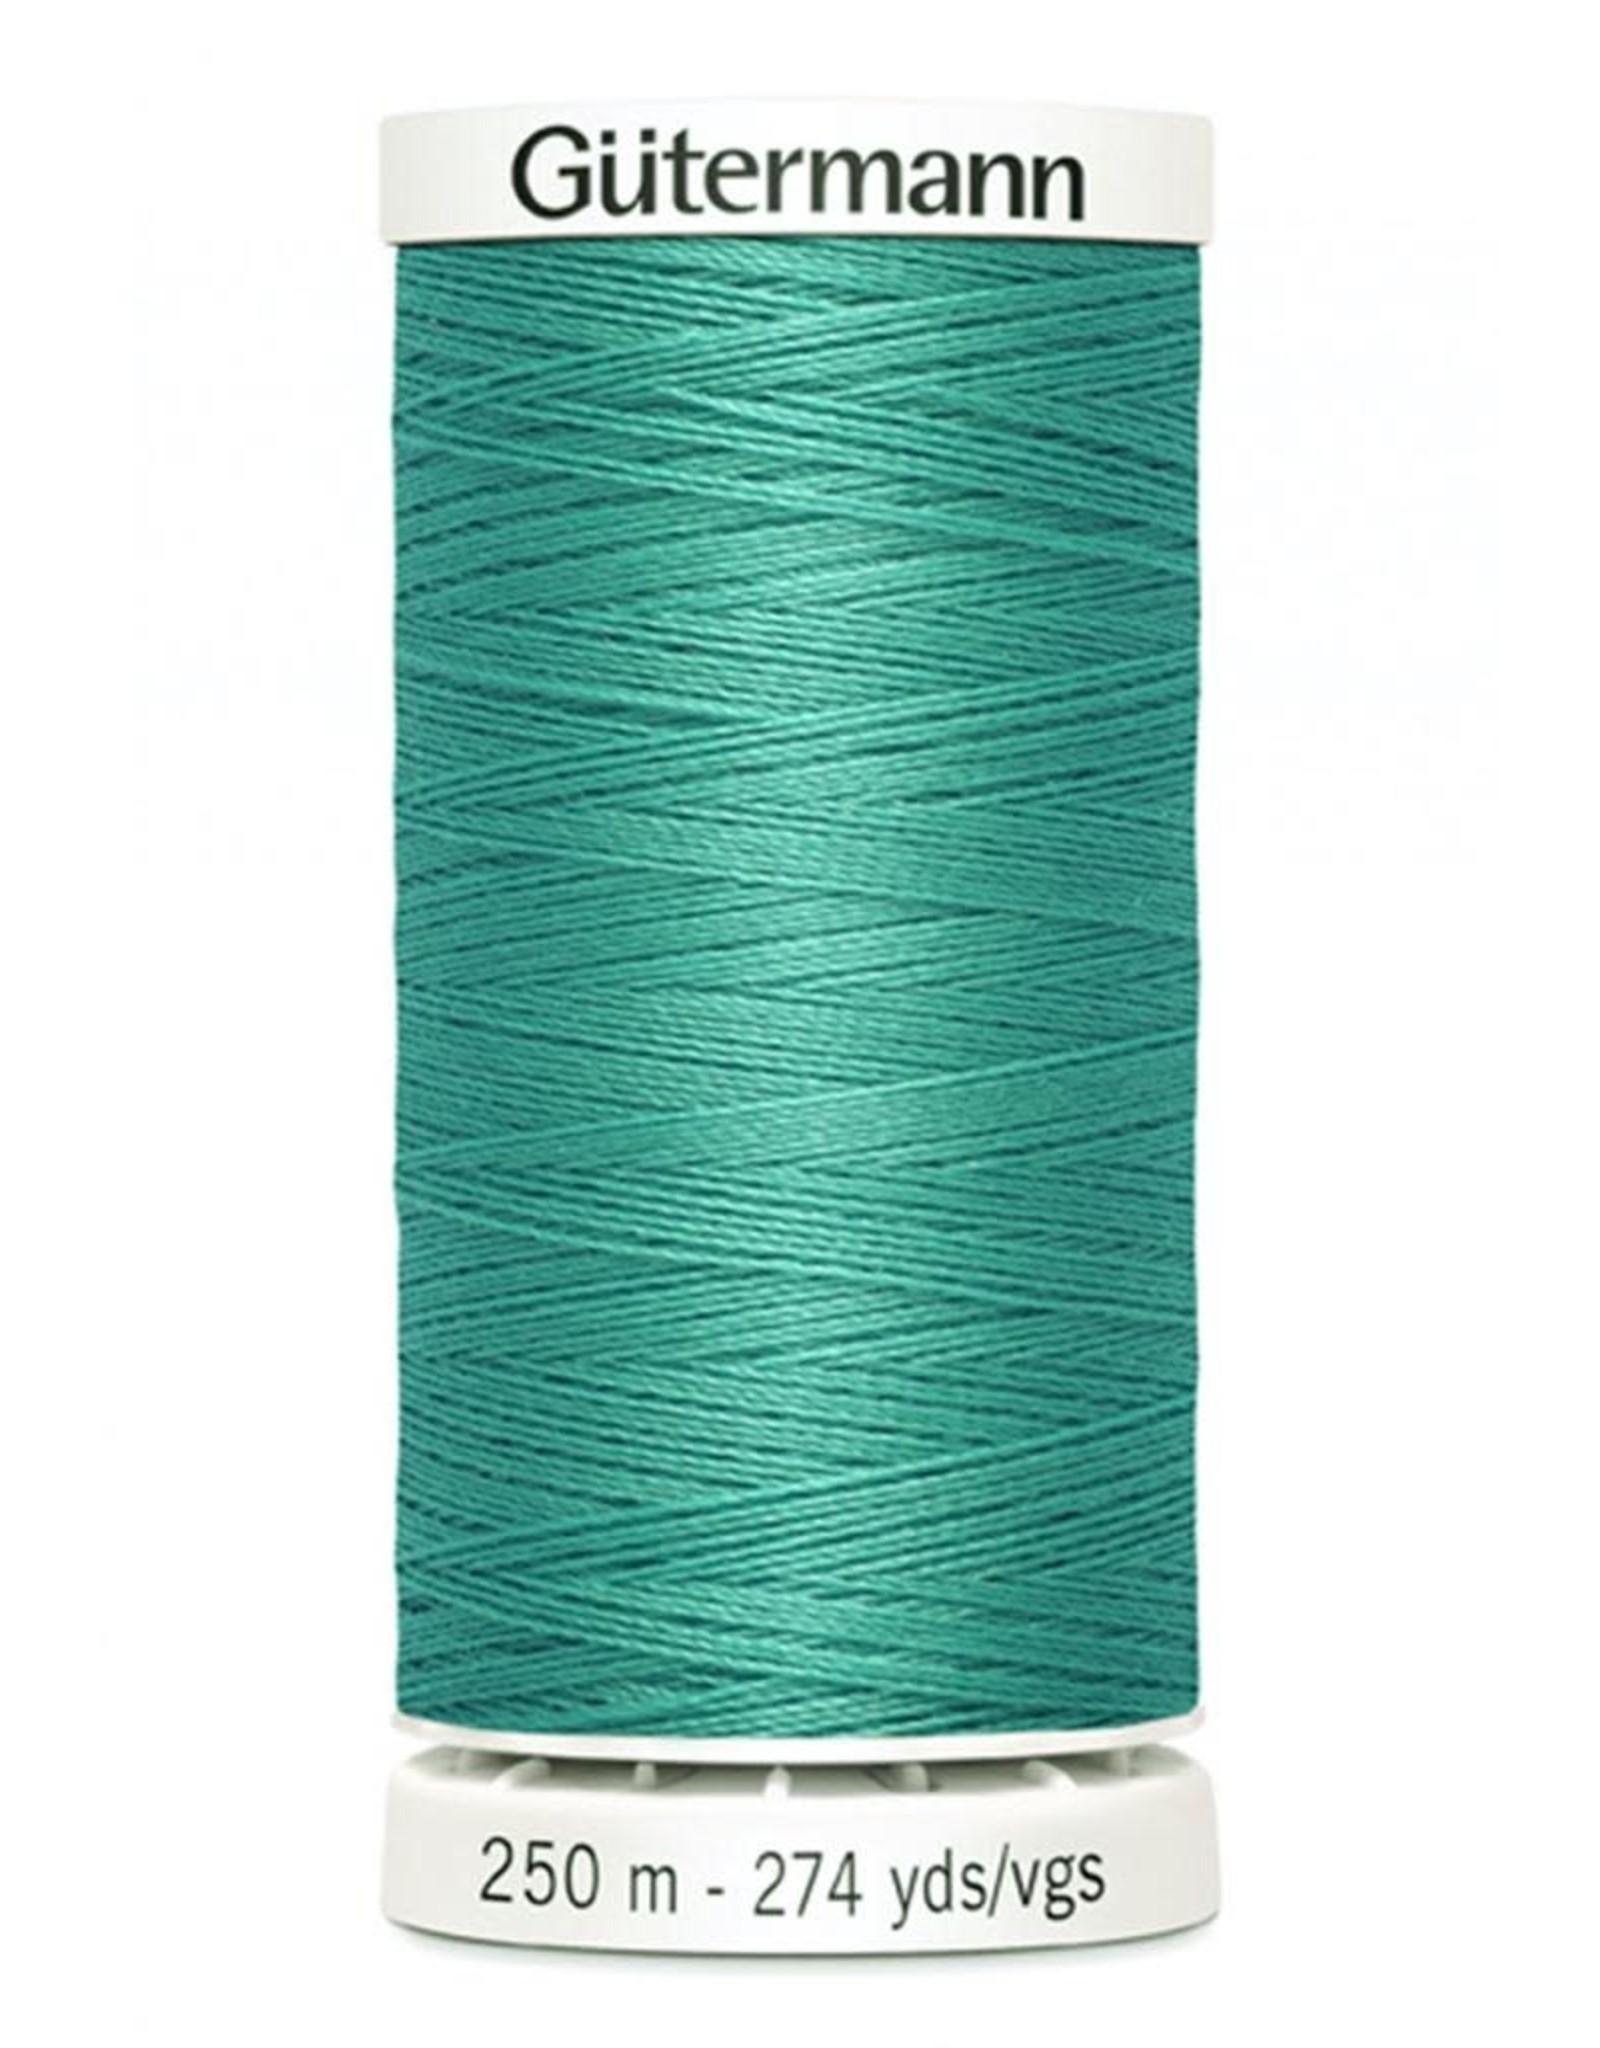 Gutermann Gutermann Thread, 250M-660 Light Turquoise, Sew-All Polyester All Purpose Thread, 250m/273yds